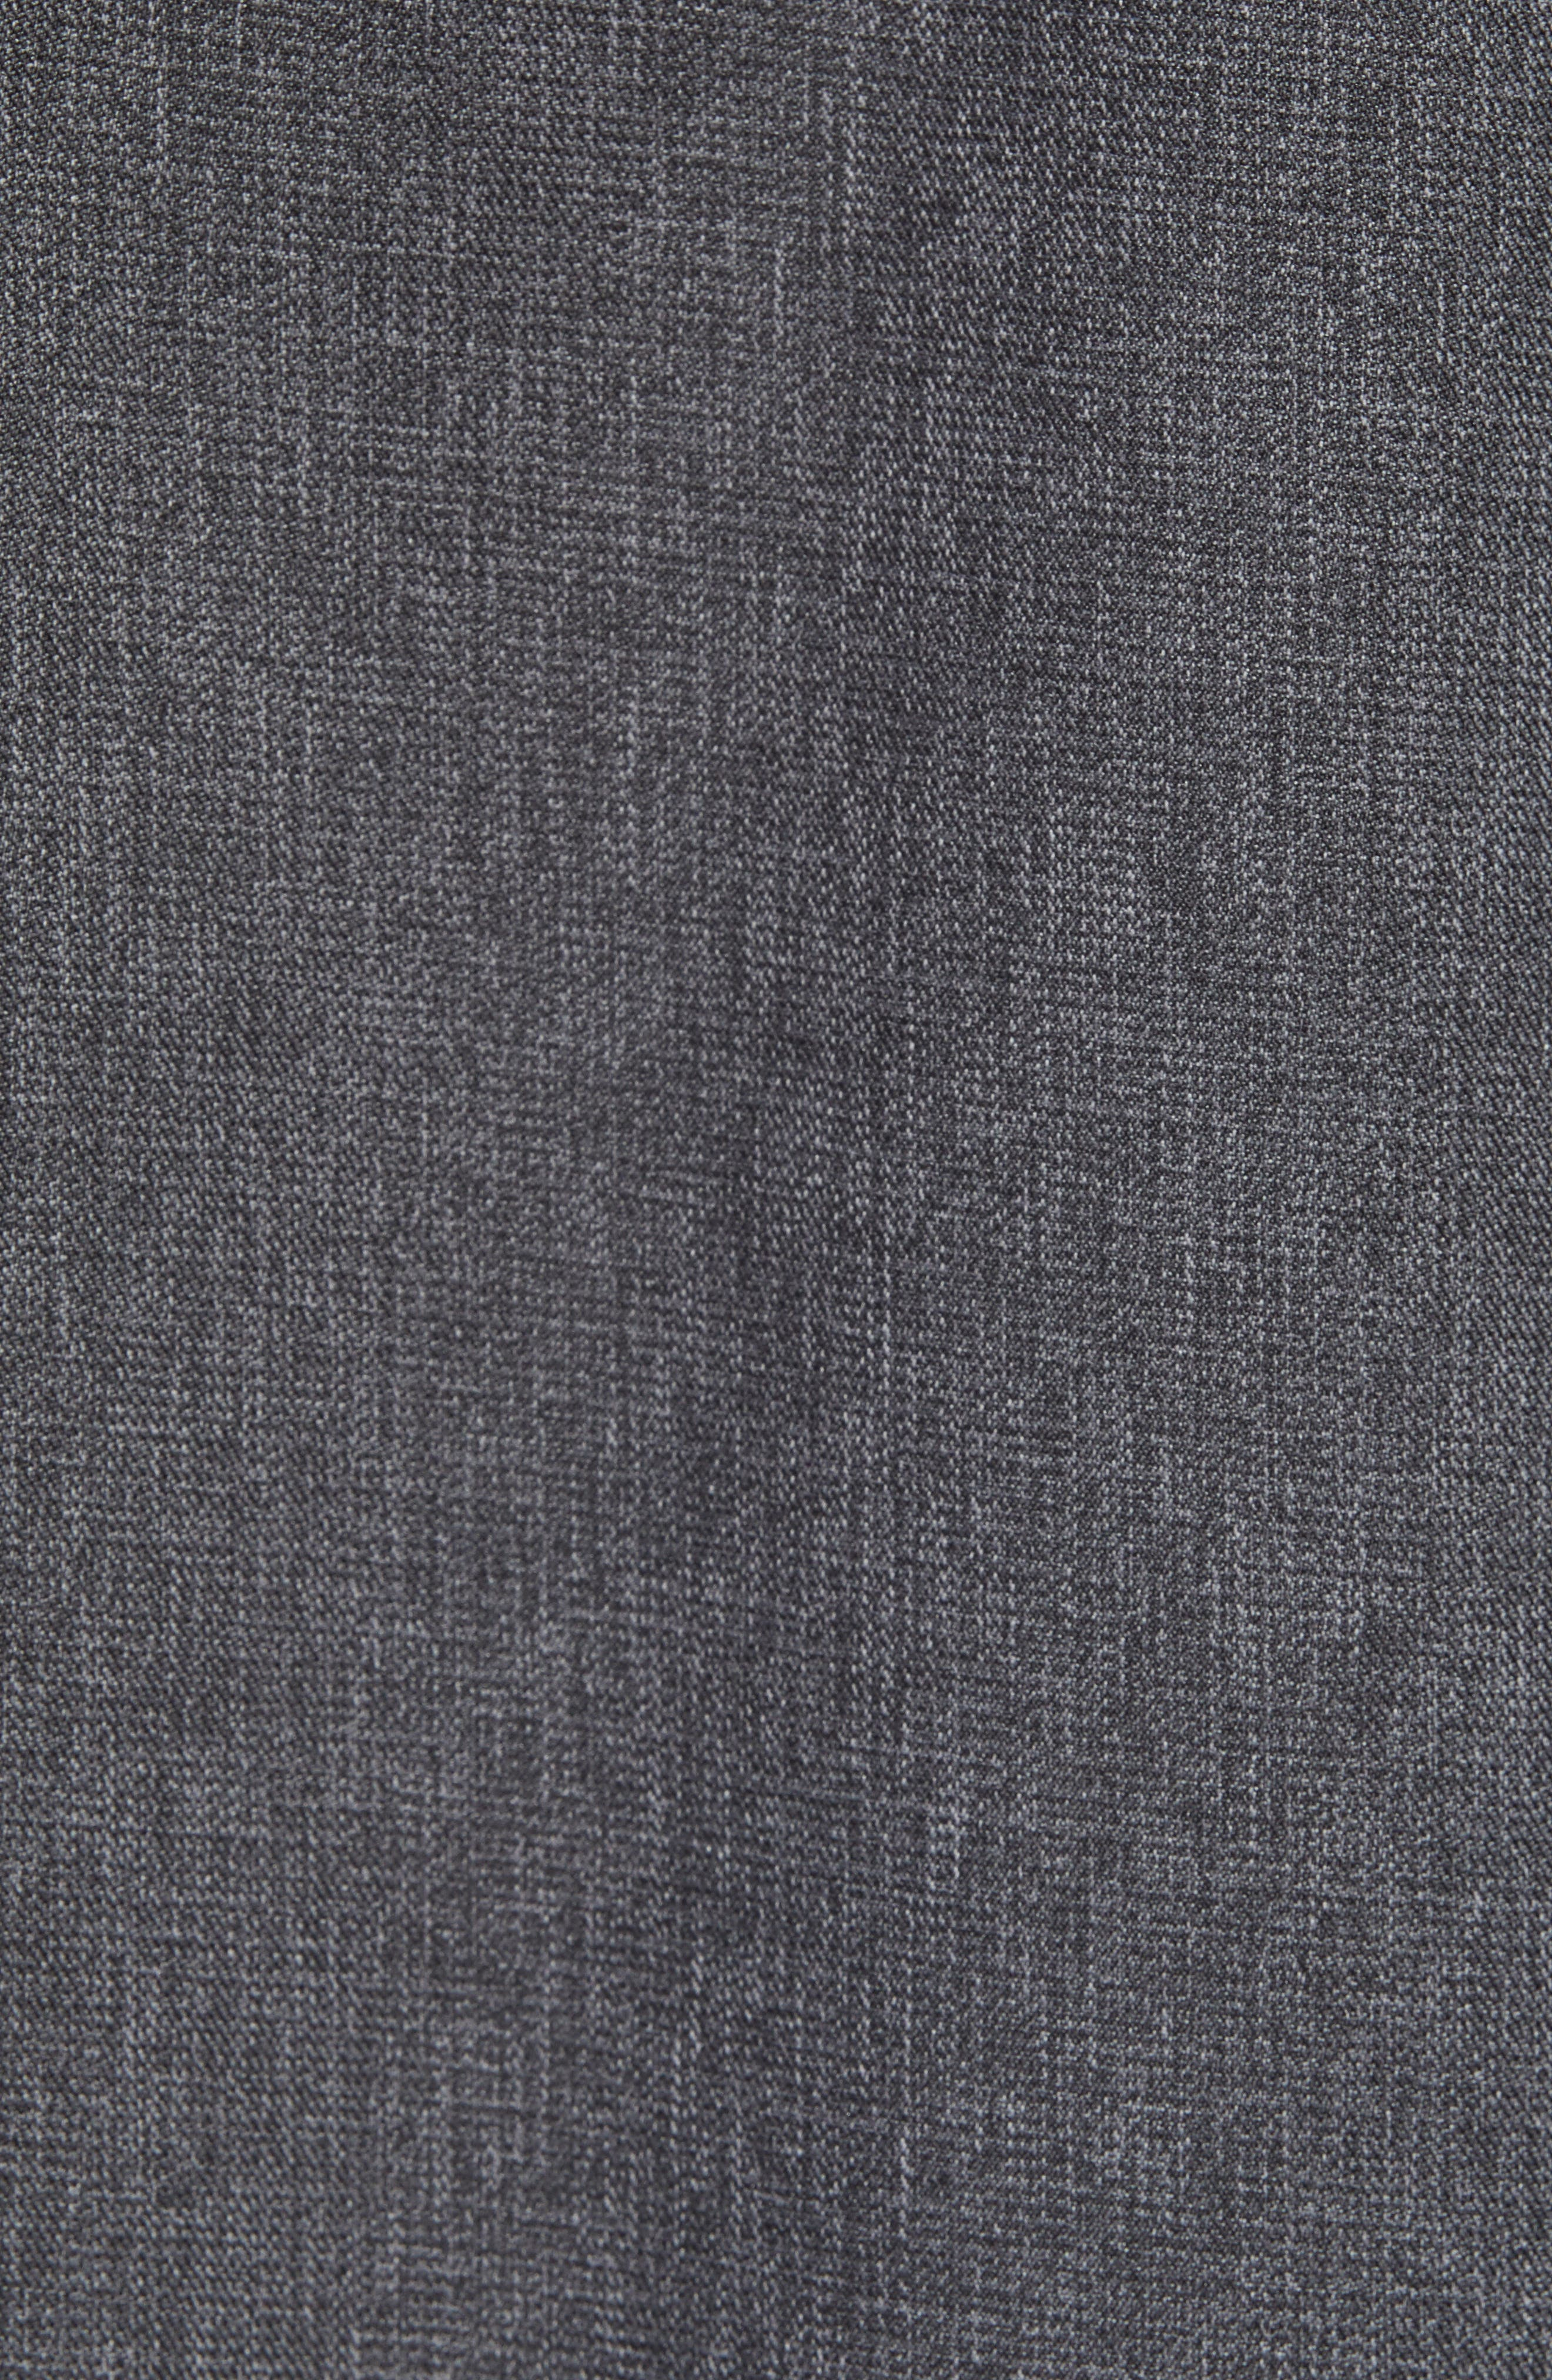 Doyle Soft Shell Jacket,                             Alternate thumbnail 6, color,                             001